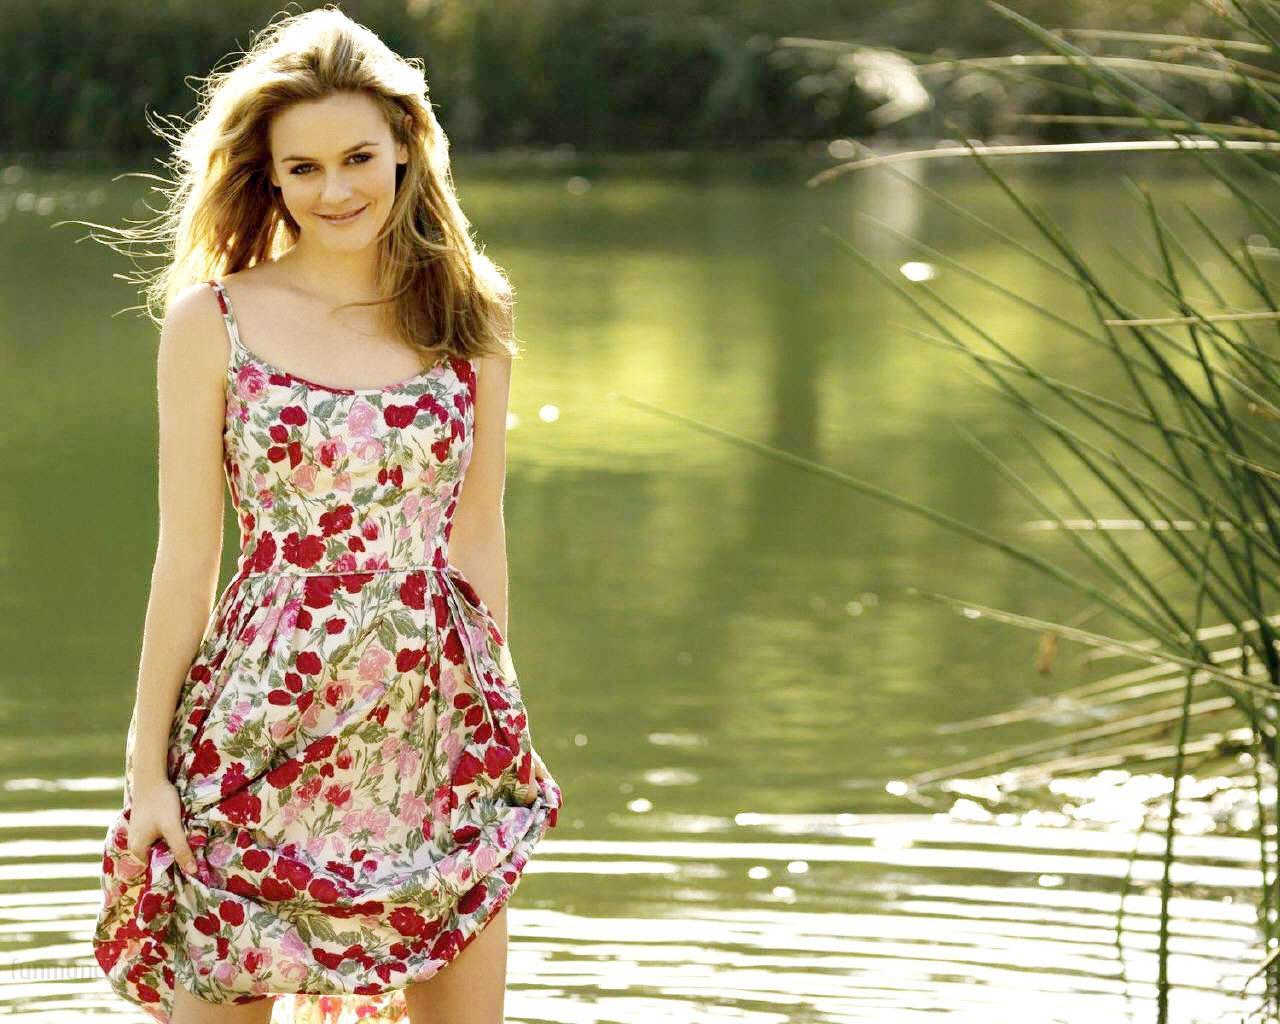 cute actress alicia silverstone wallpaper